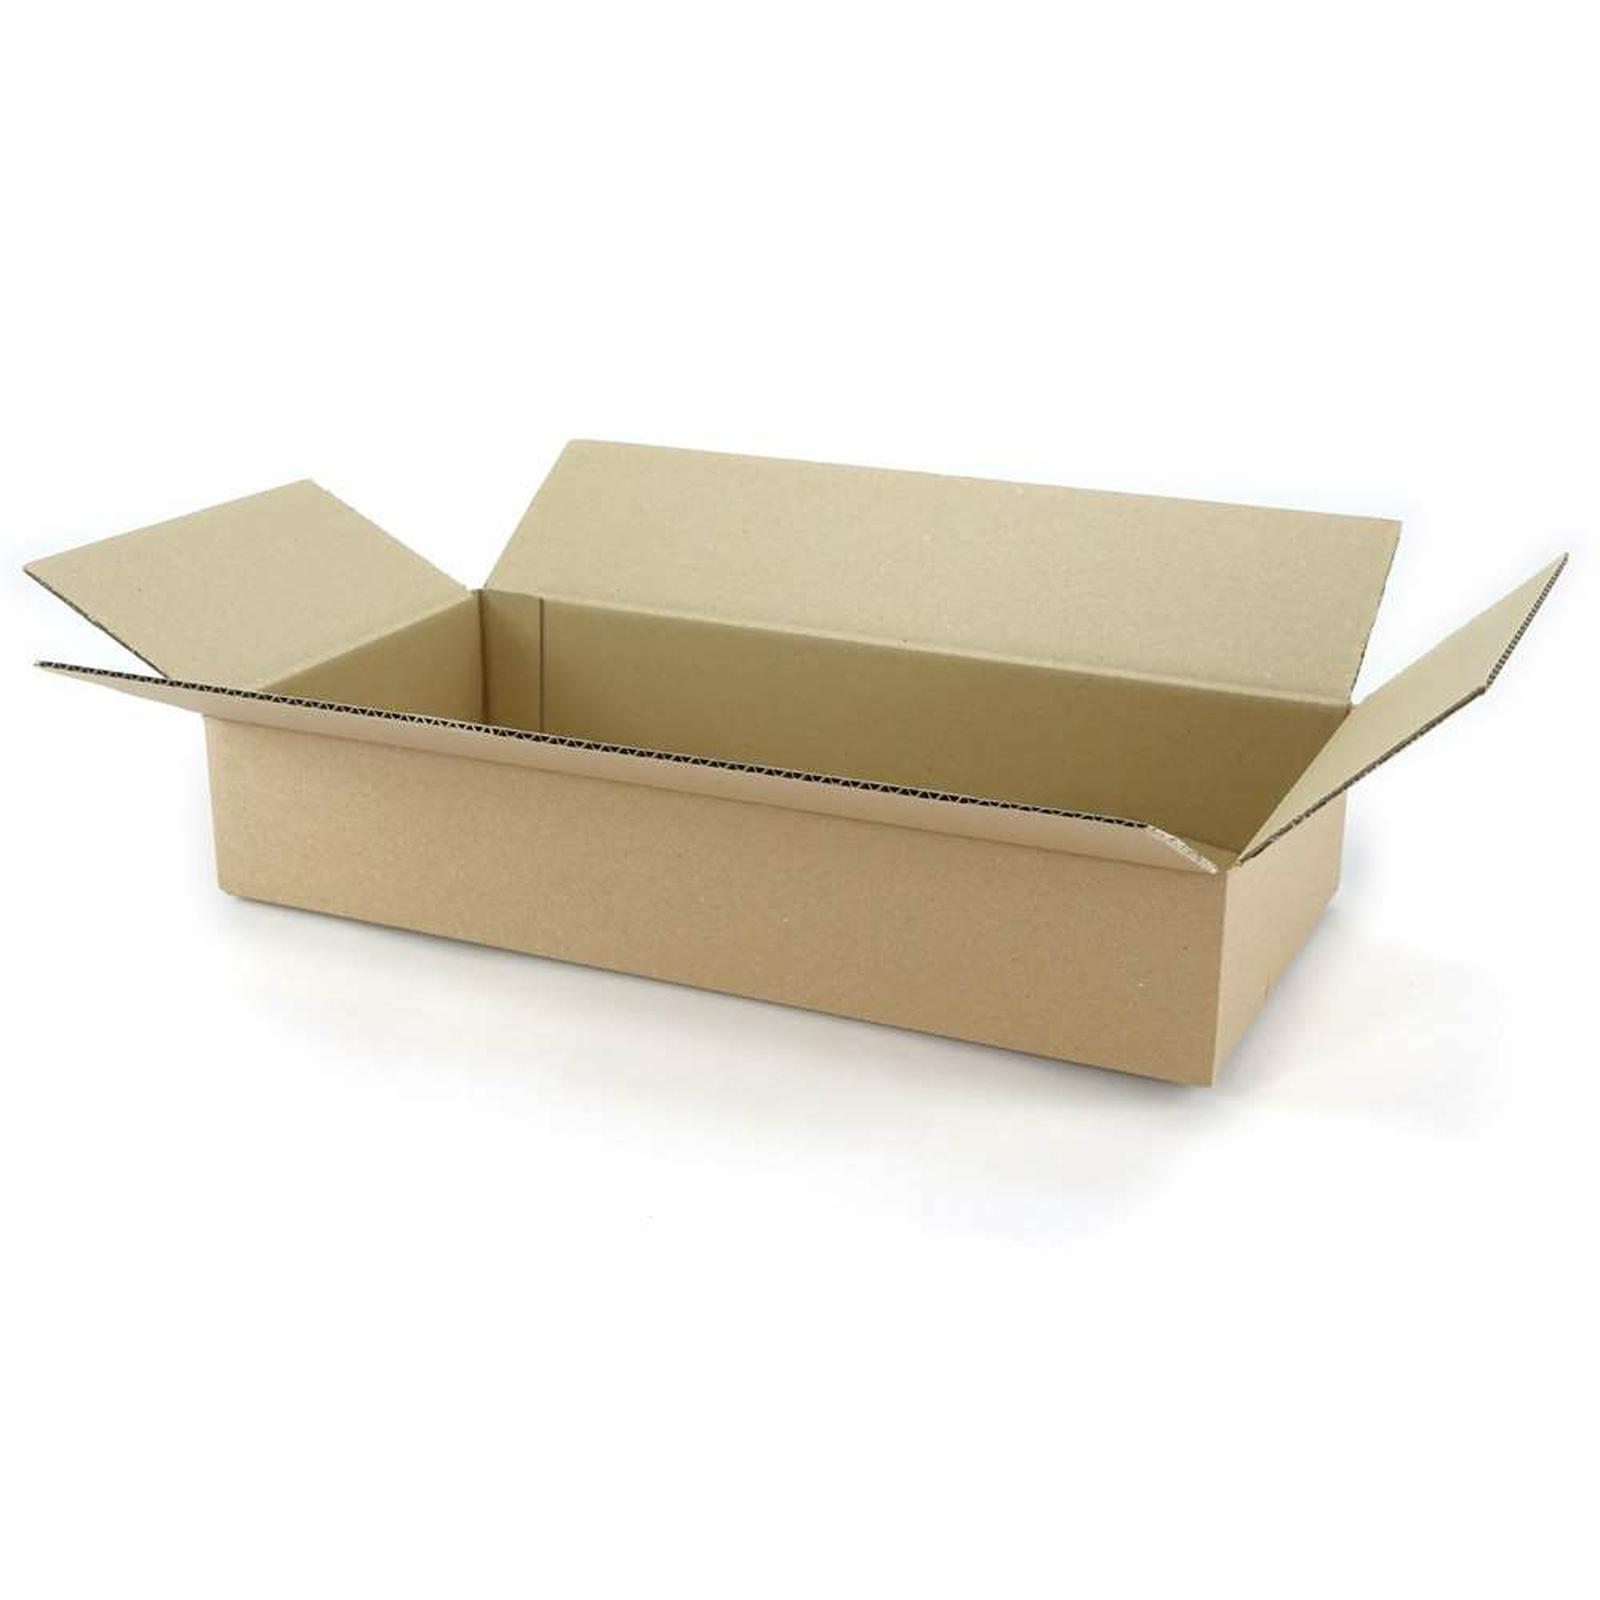 einwellige kartons 420x200x80 mm g nstig kaufen 0 29. Black Bedroom Furniture Sets. Home Design Ideas